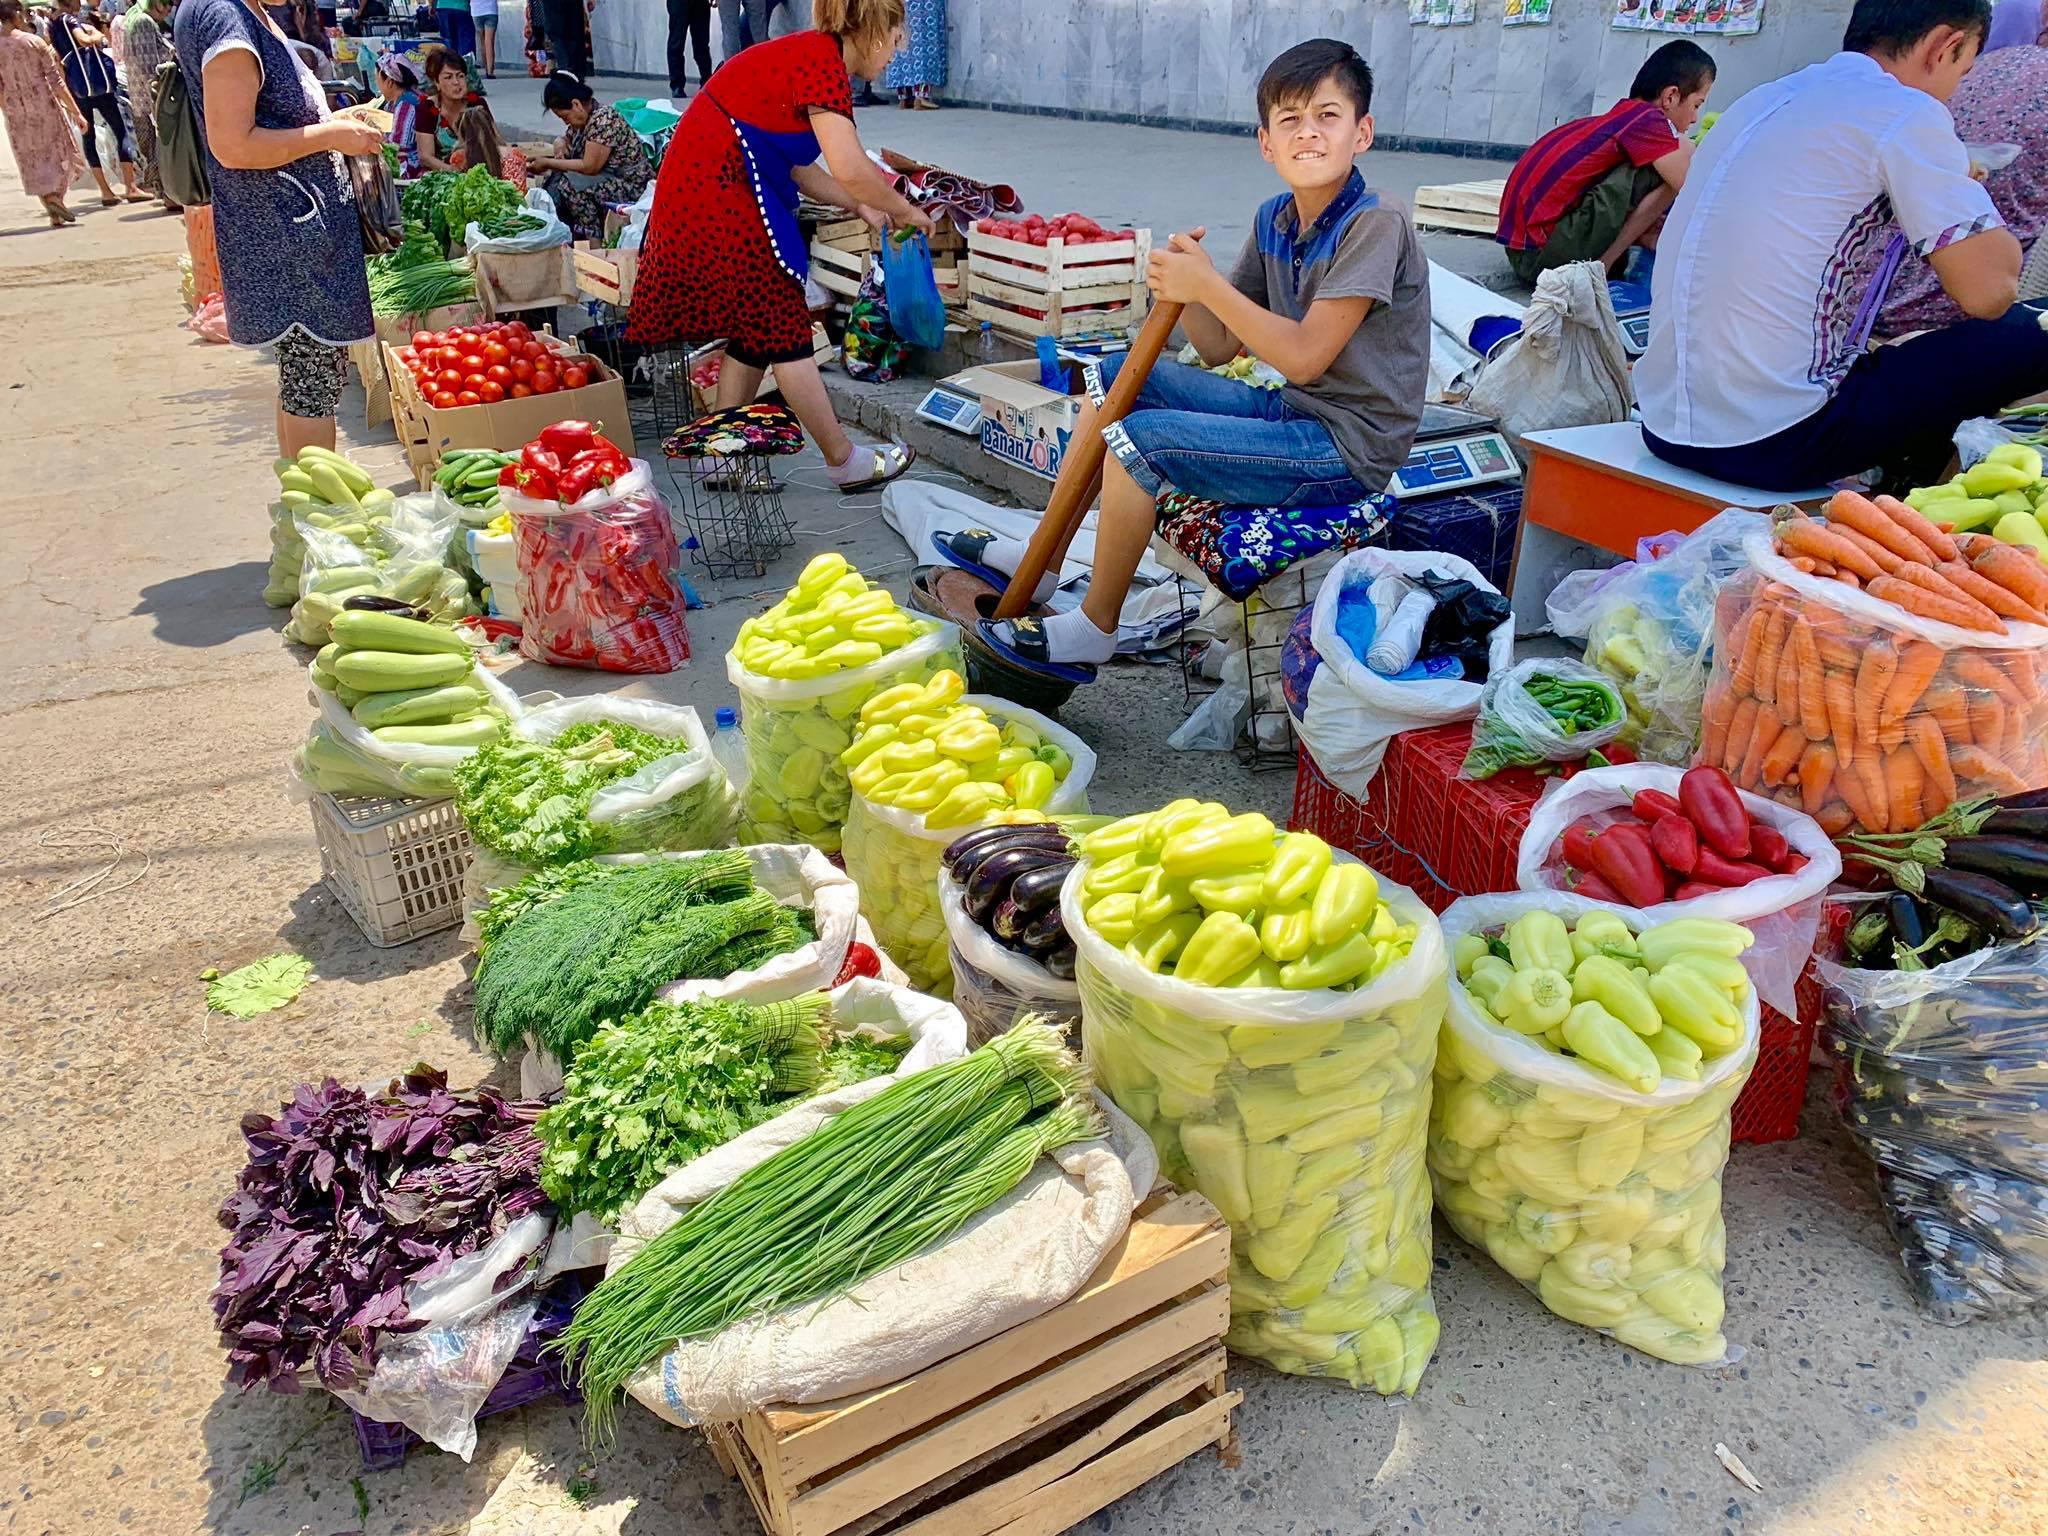 Kach Solo Travels in 2019 Siyab Bazaar and Registan on my first day in Samarkand18.jpg